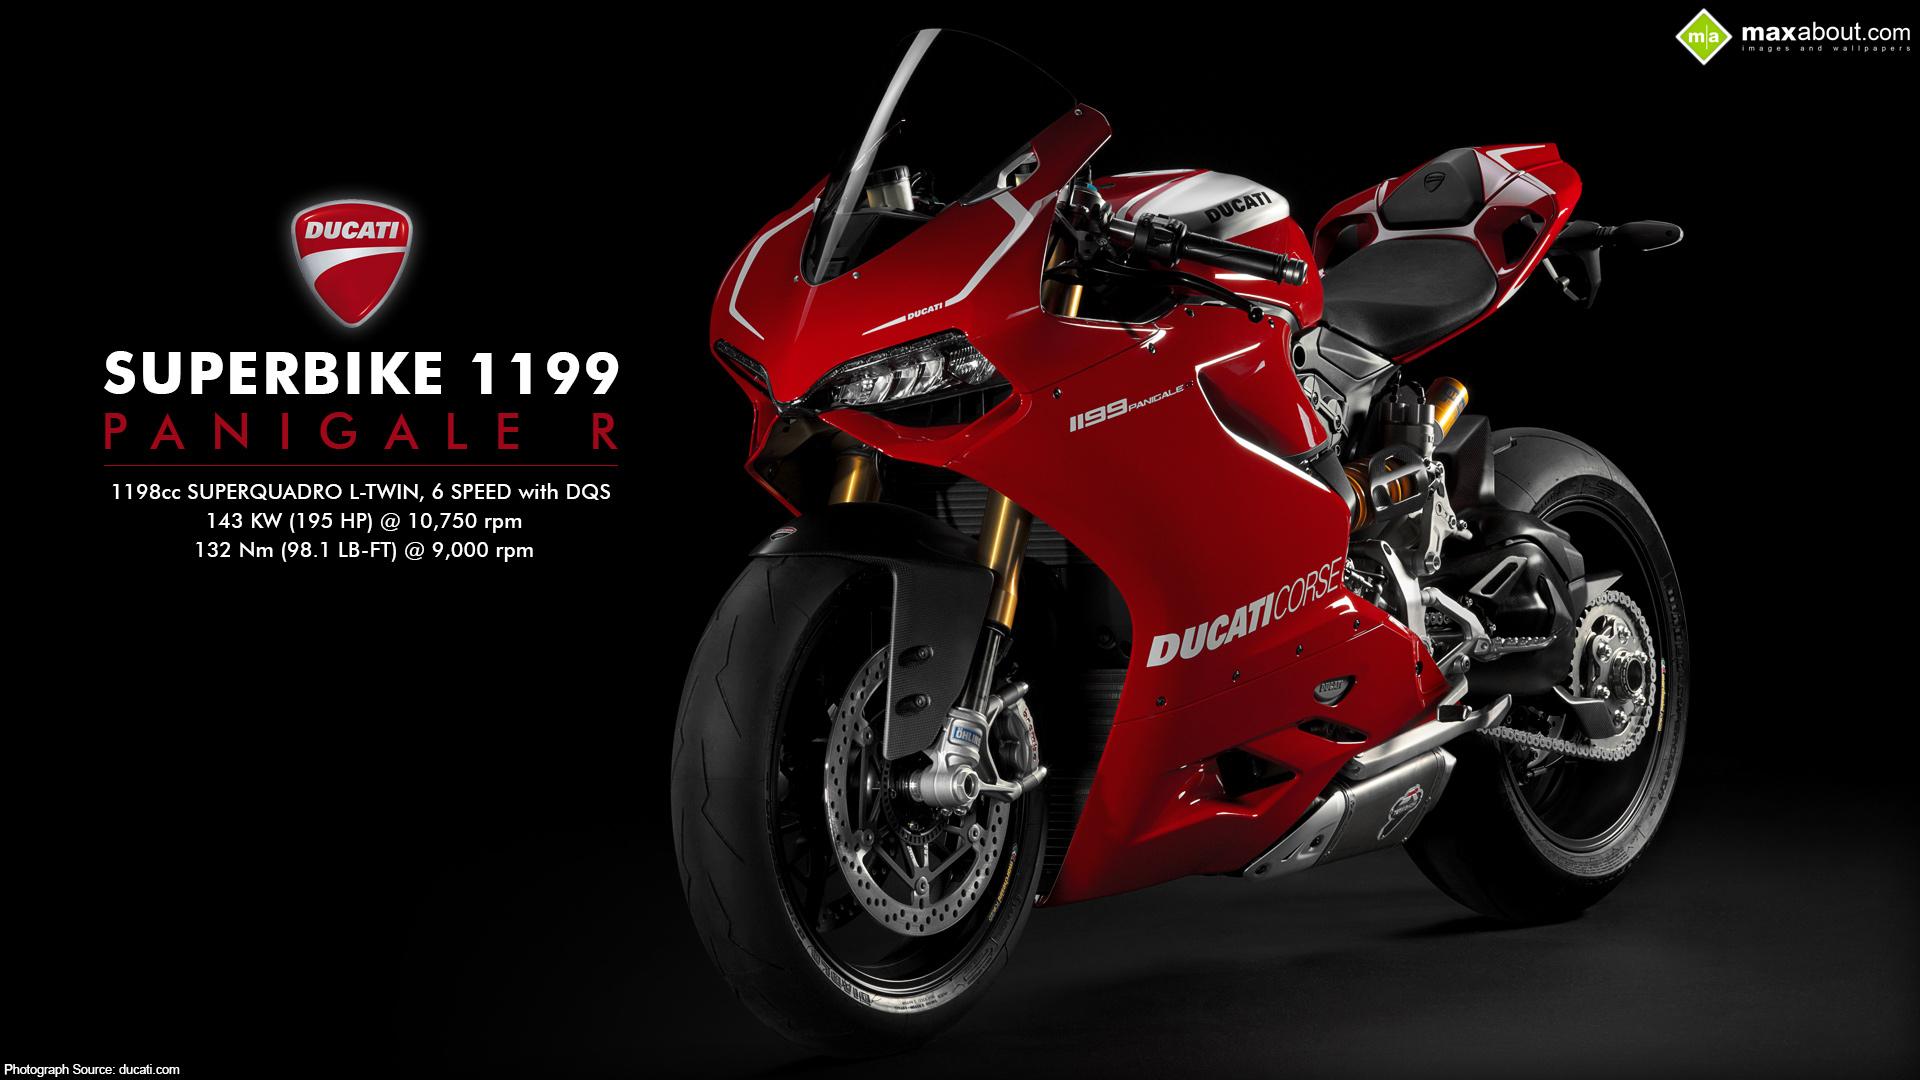 Ducati Ducati 1199 Motorcycle Motorcycles 1920x1080 1920x1080